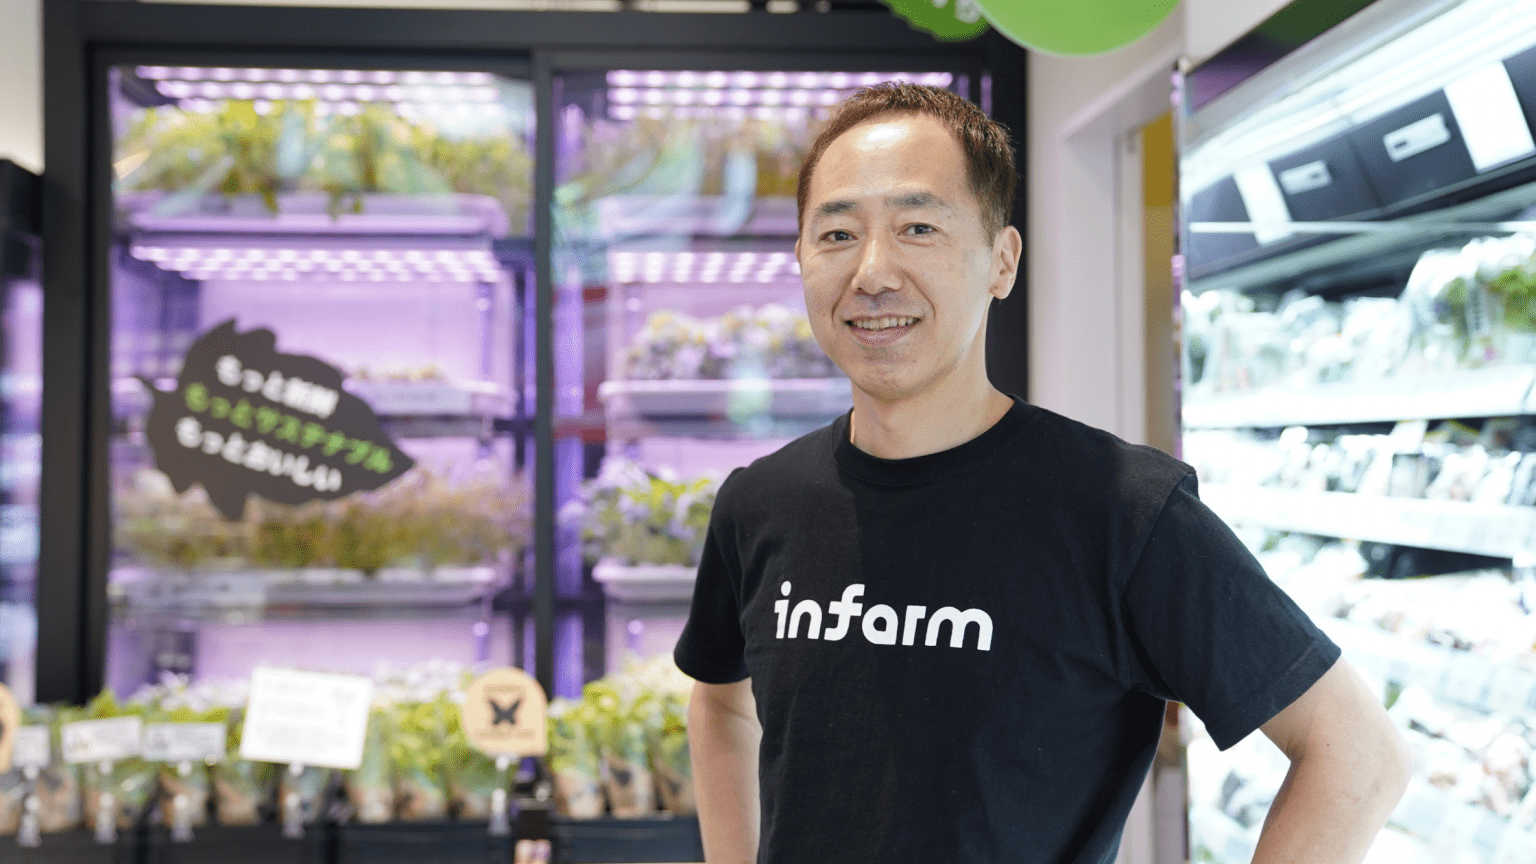 Meet AsiaBerlin Ambassador Ikuo Hiraishi  Managing Director at Infarm Japan